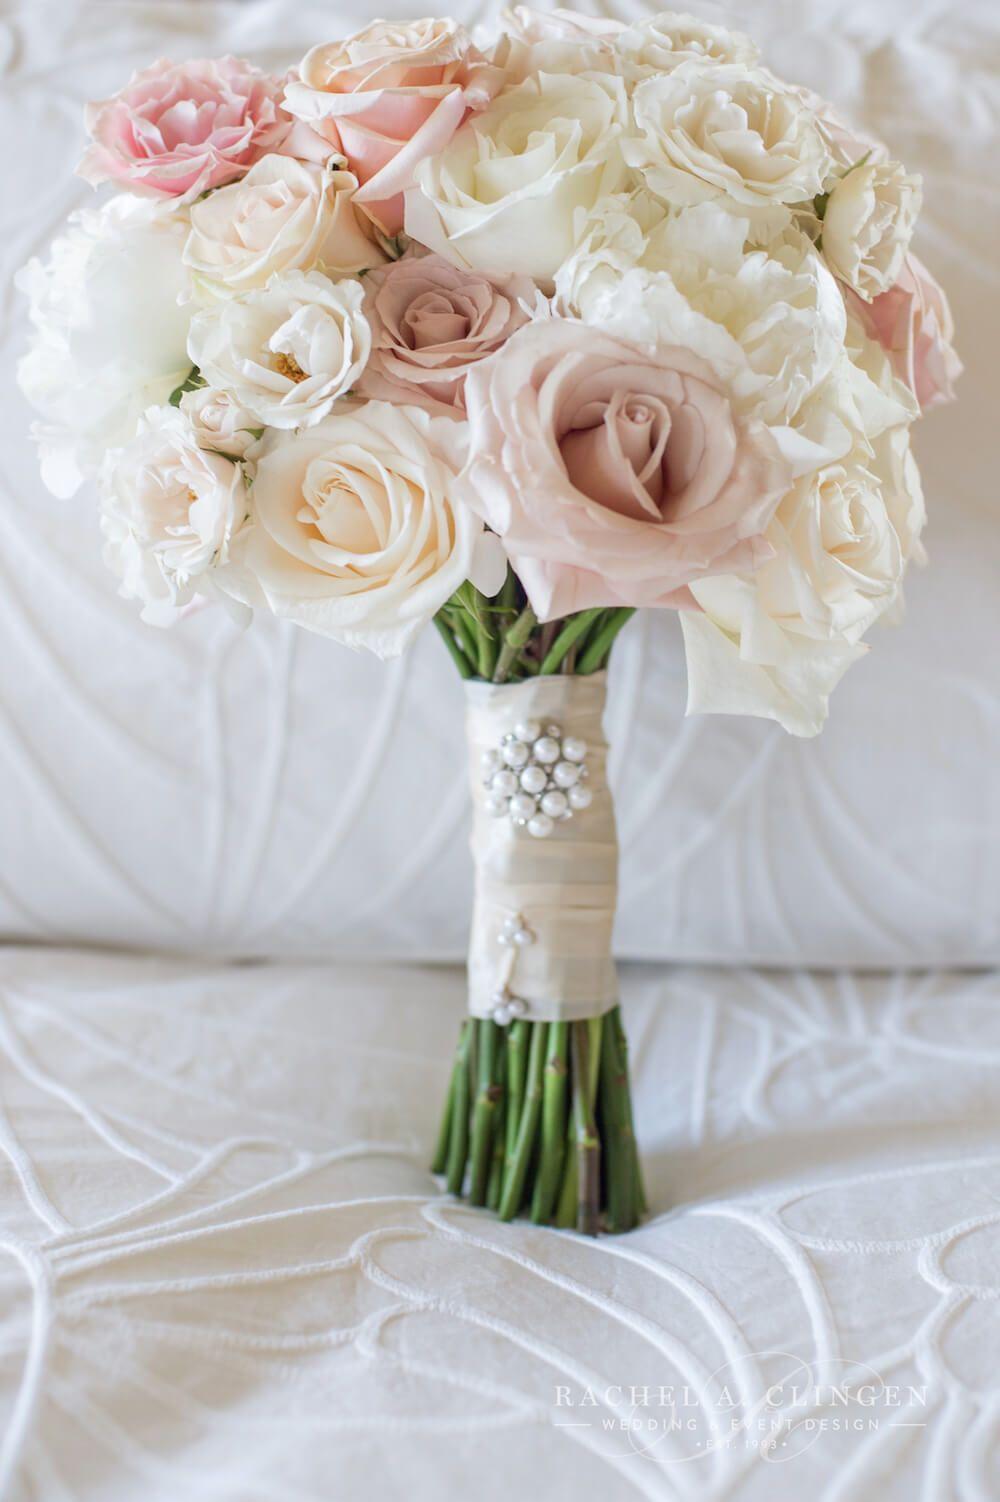 Ivory Pink Blush Wedding Bouquet Finished With Ivory Satin Bow